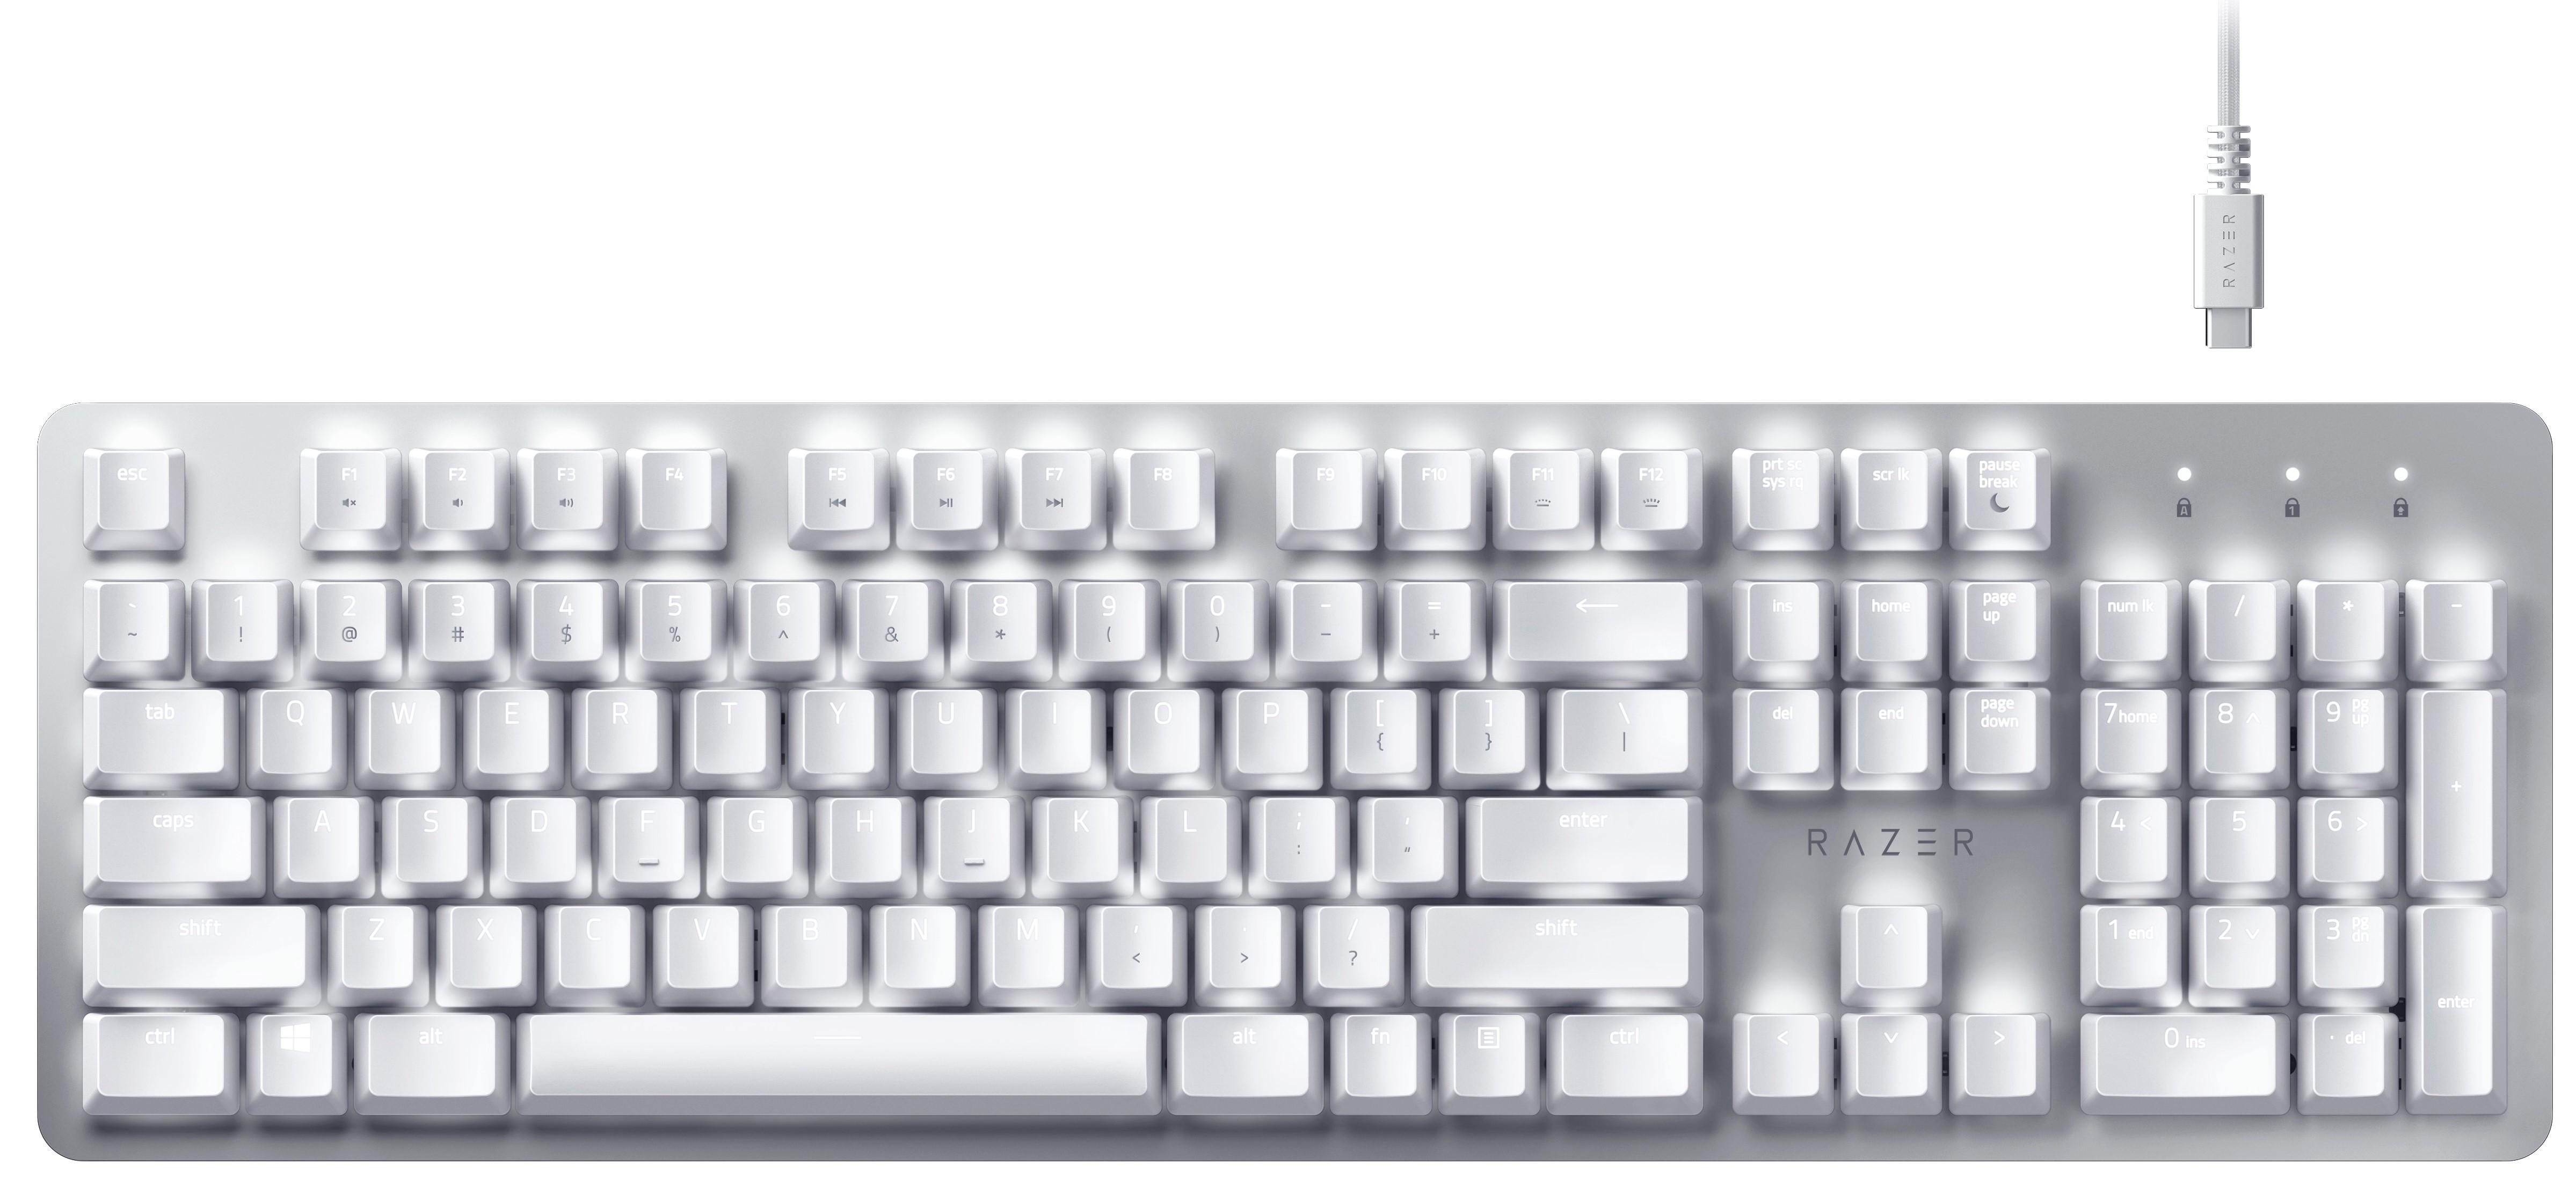 El teclado Razer Pro Type